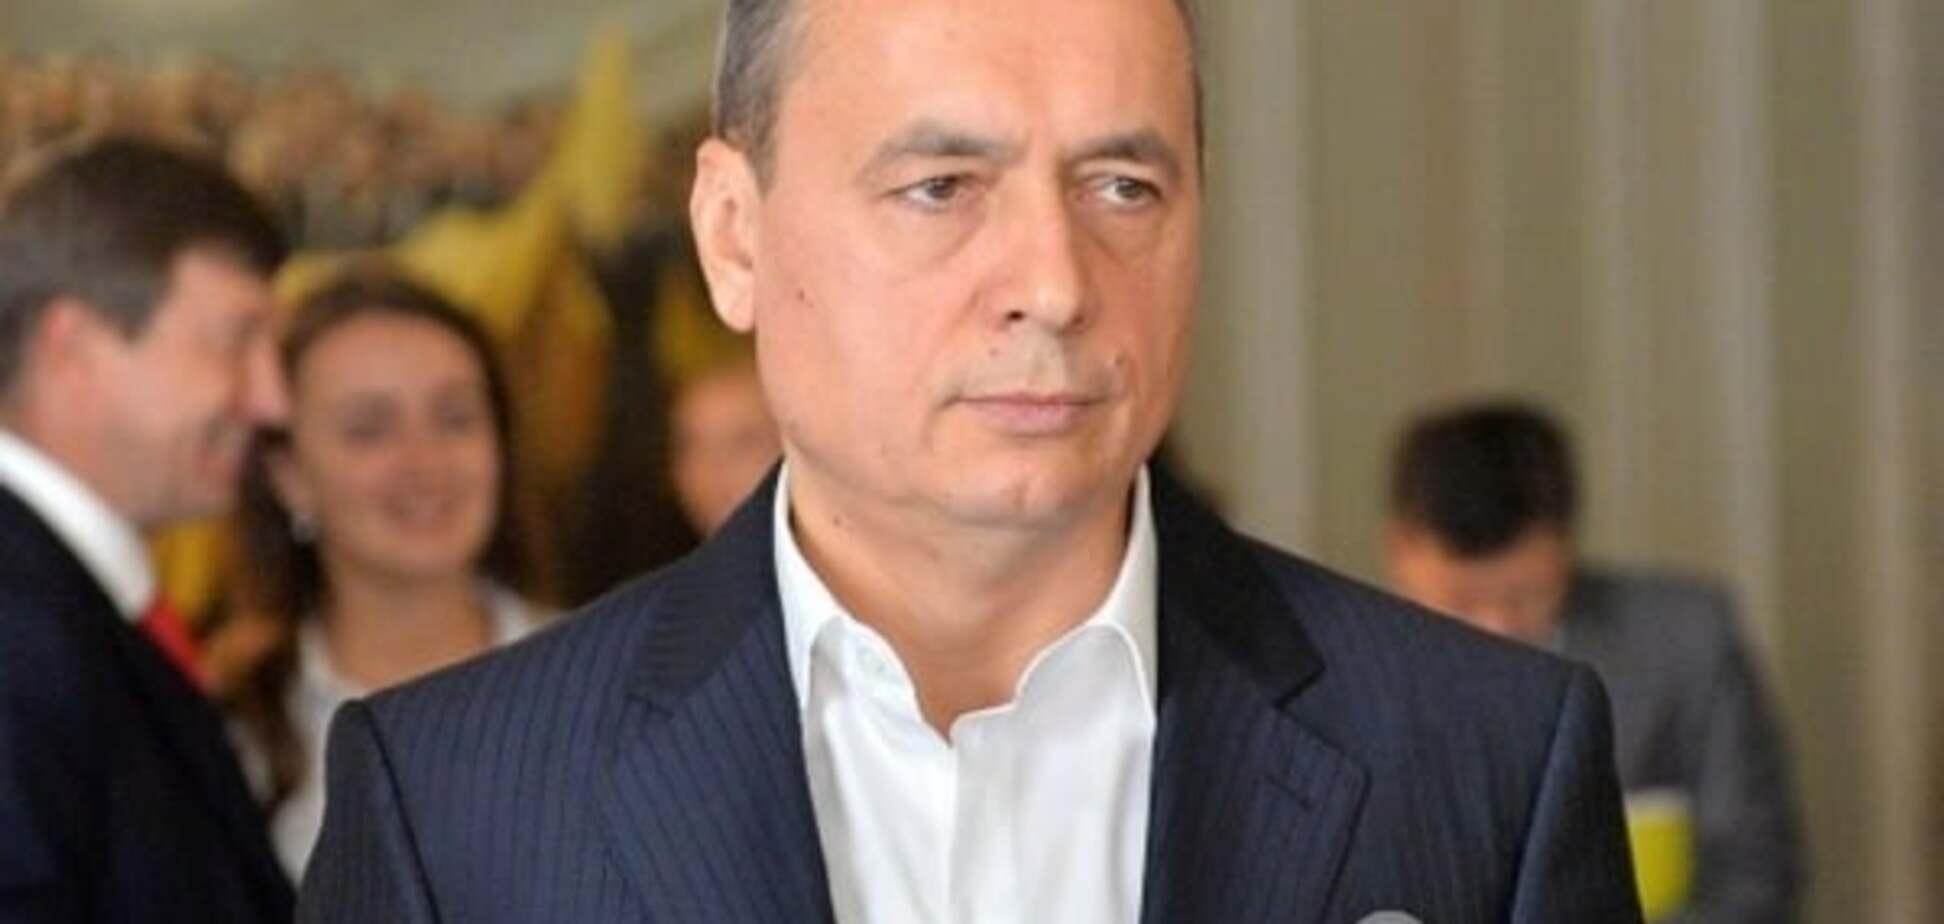 НАБУ передасть справу Мартиненка в суд вже у лютому - Ситник